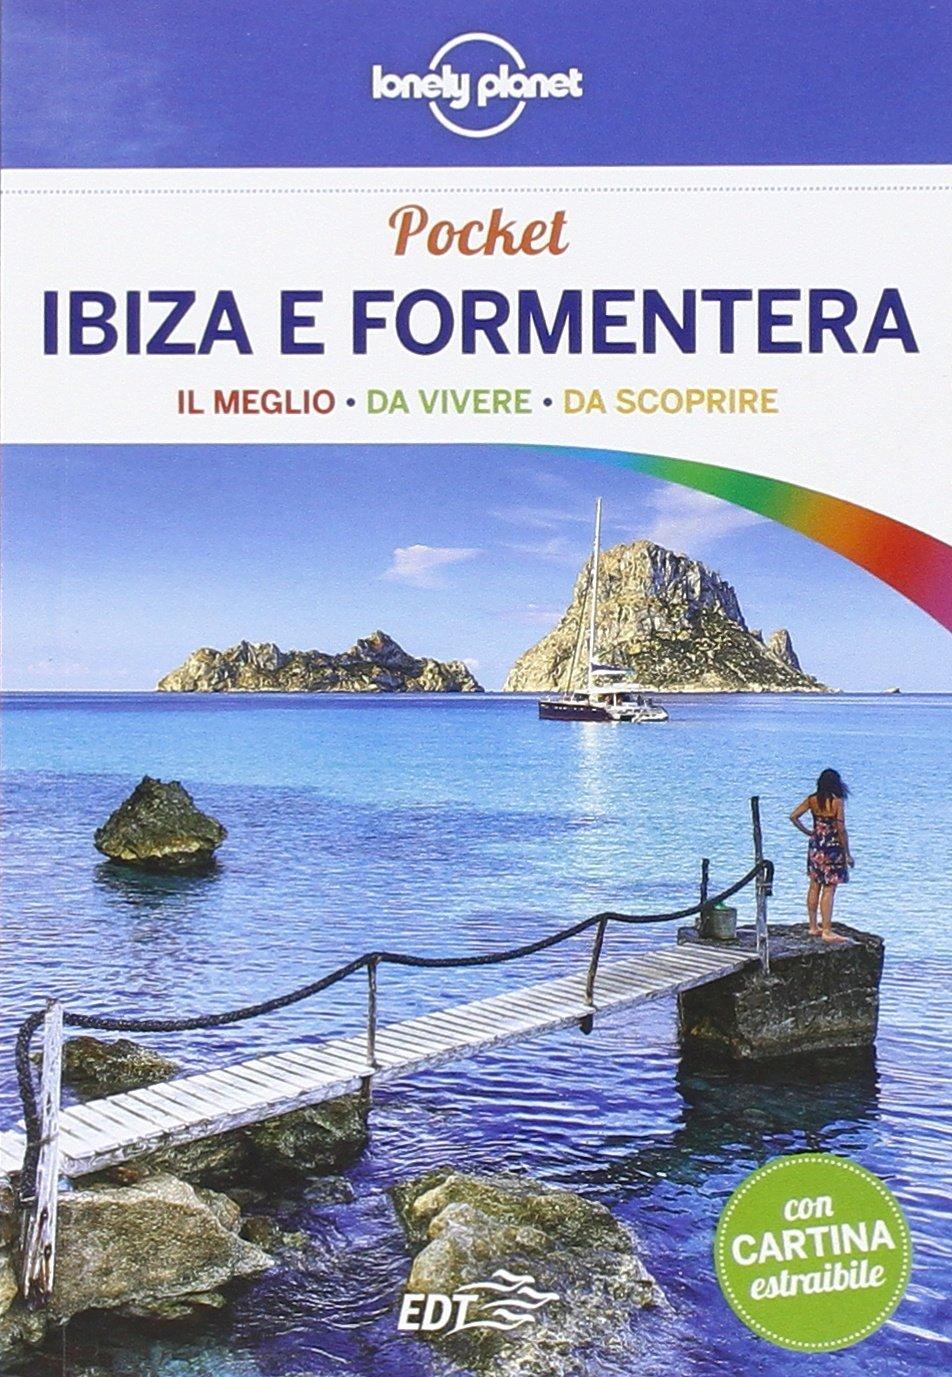 Cartina Geografica Spagna E Formentera.Ibiza E Formentera Con Cartina Amazon It Stewart Iain Libri